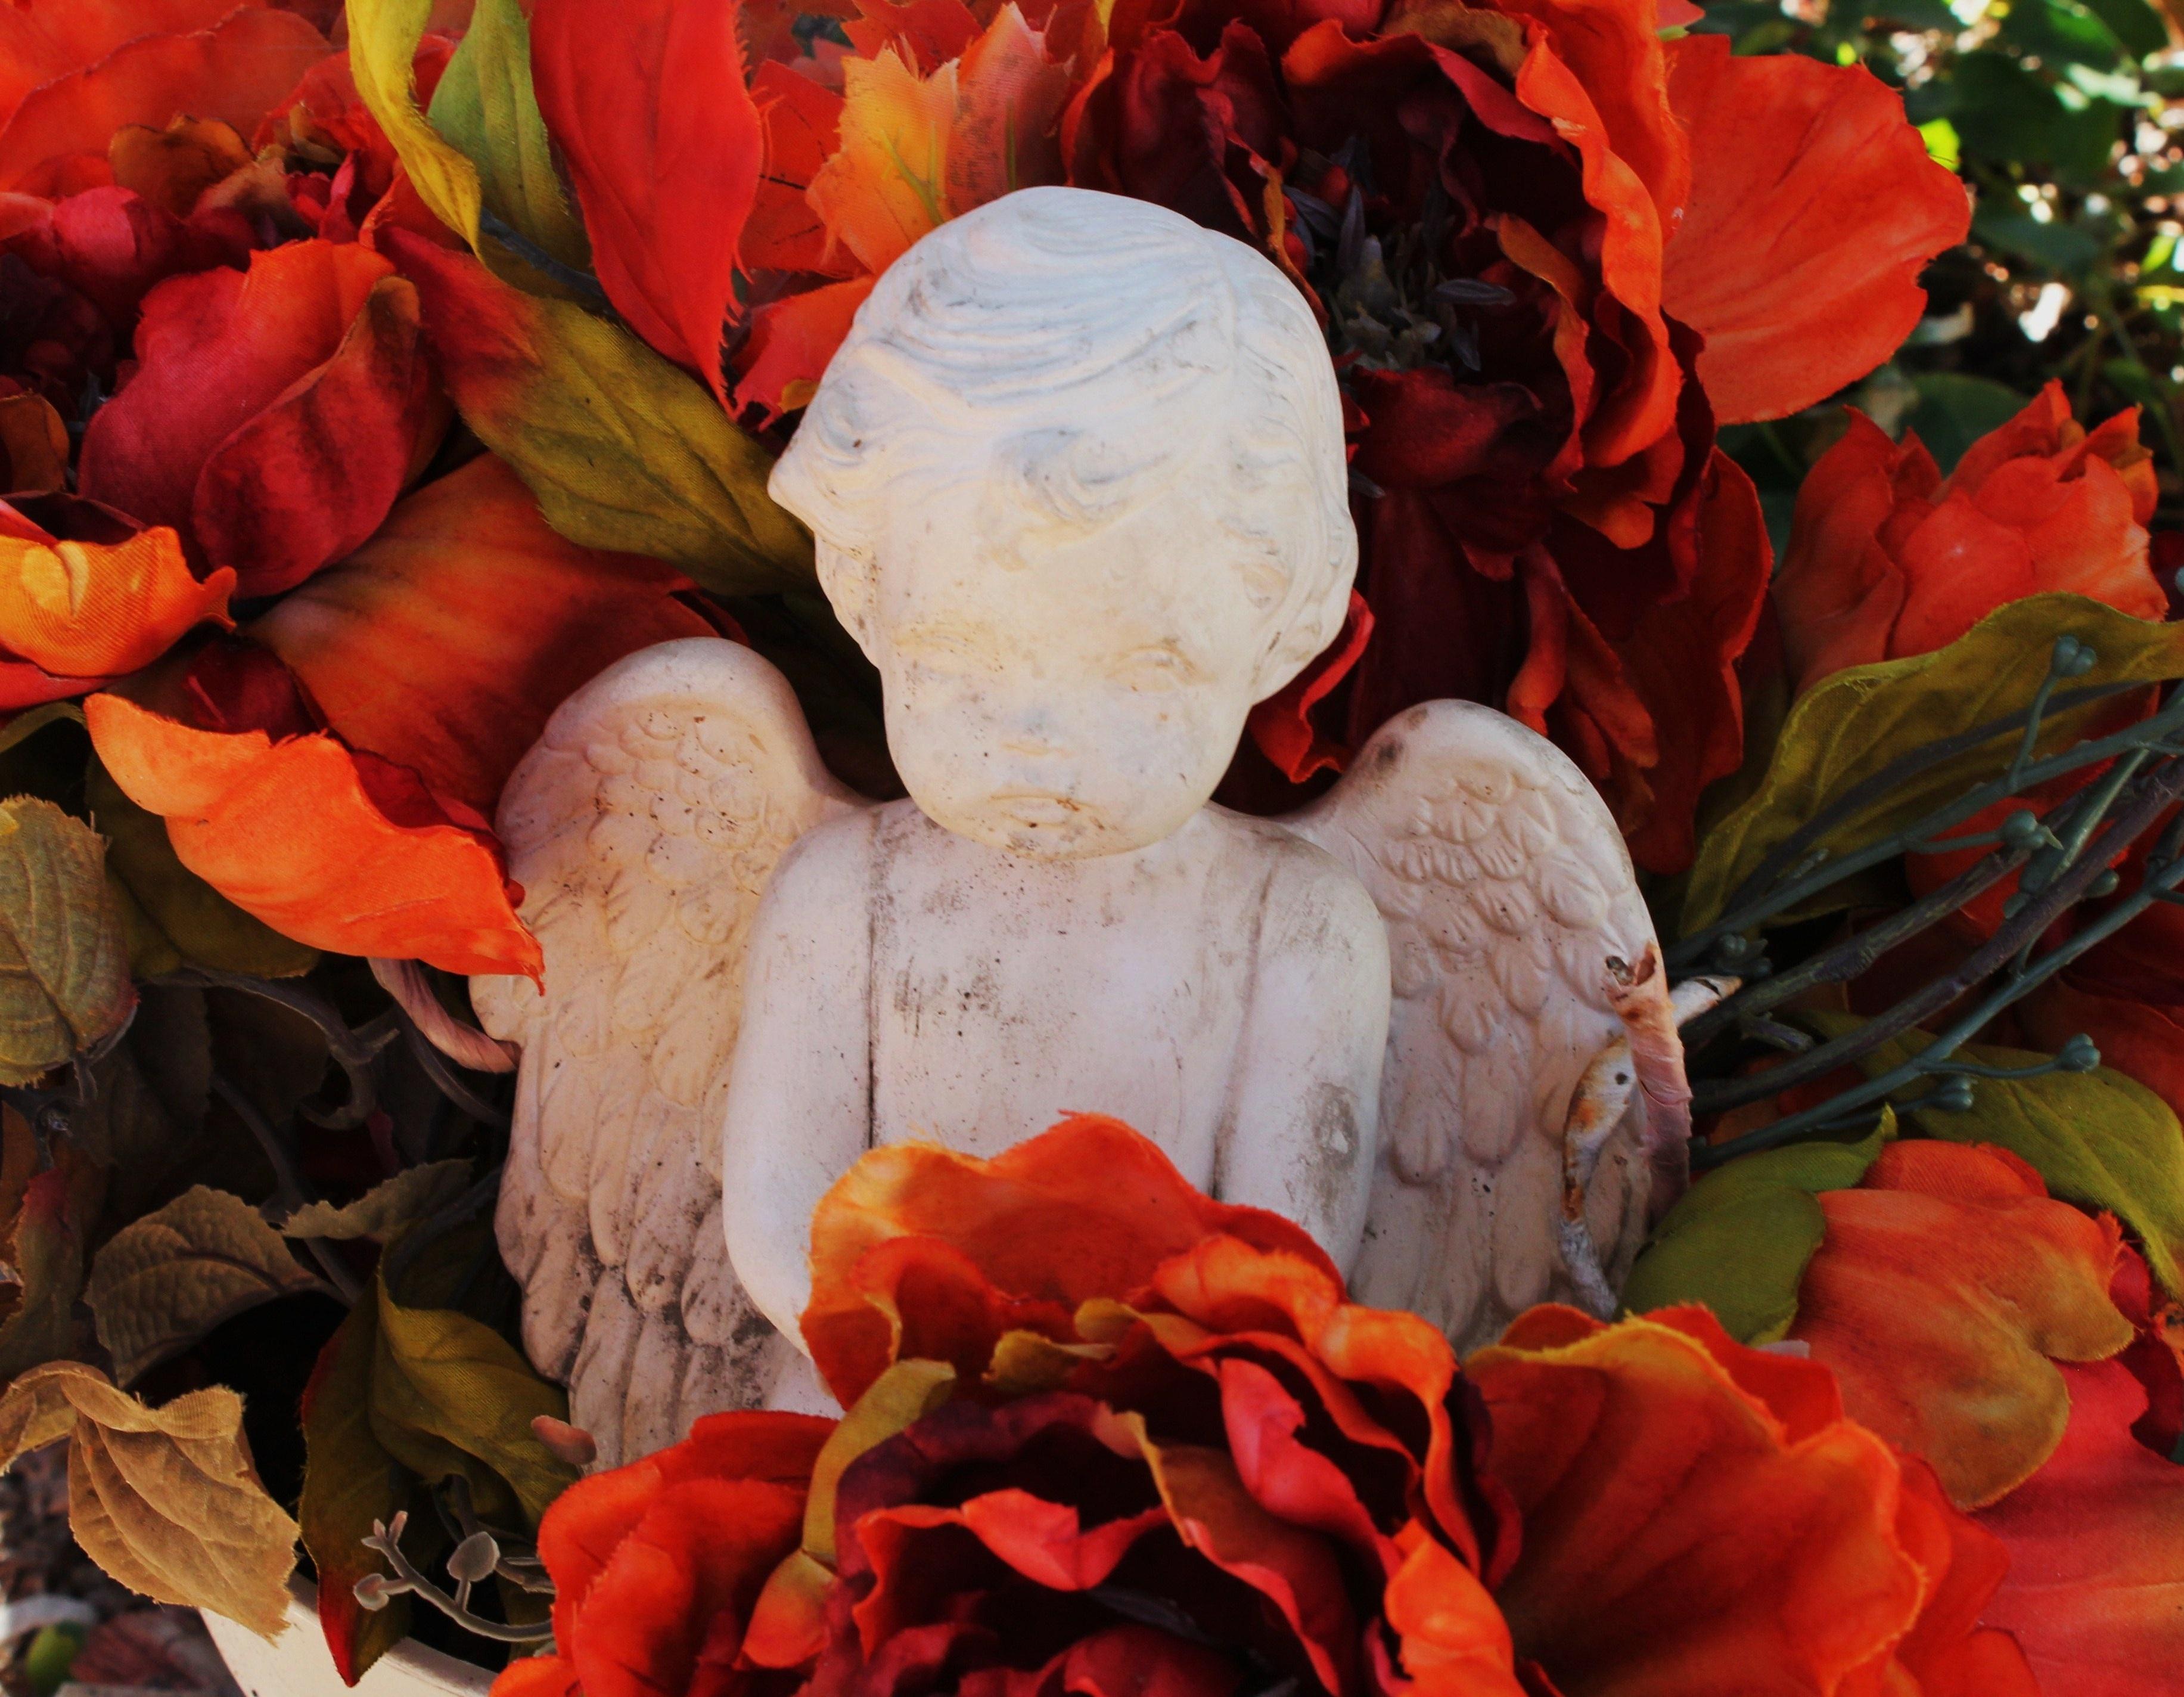 Fotos gratis : naturaleza, ala, planta, hoja, flor, piedra, estatua ...